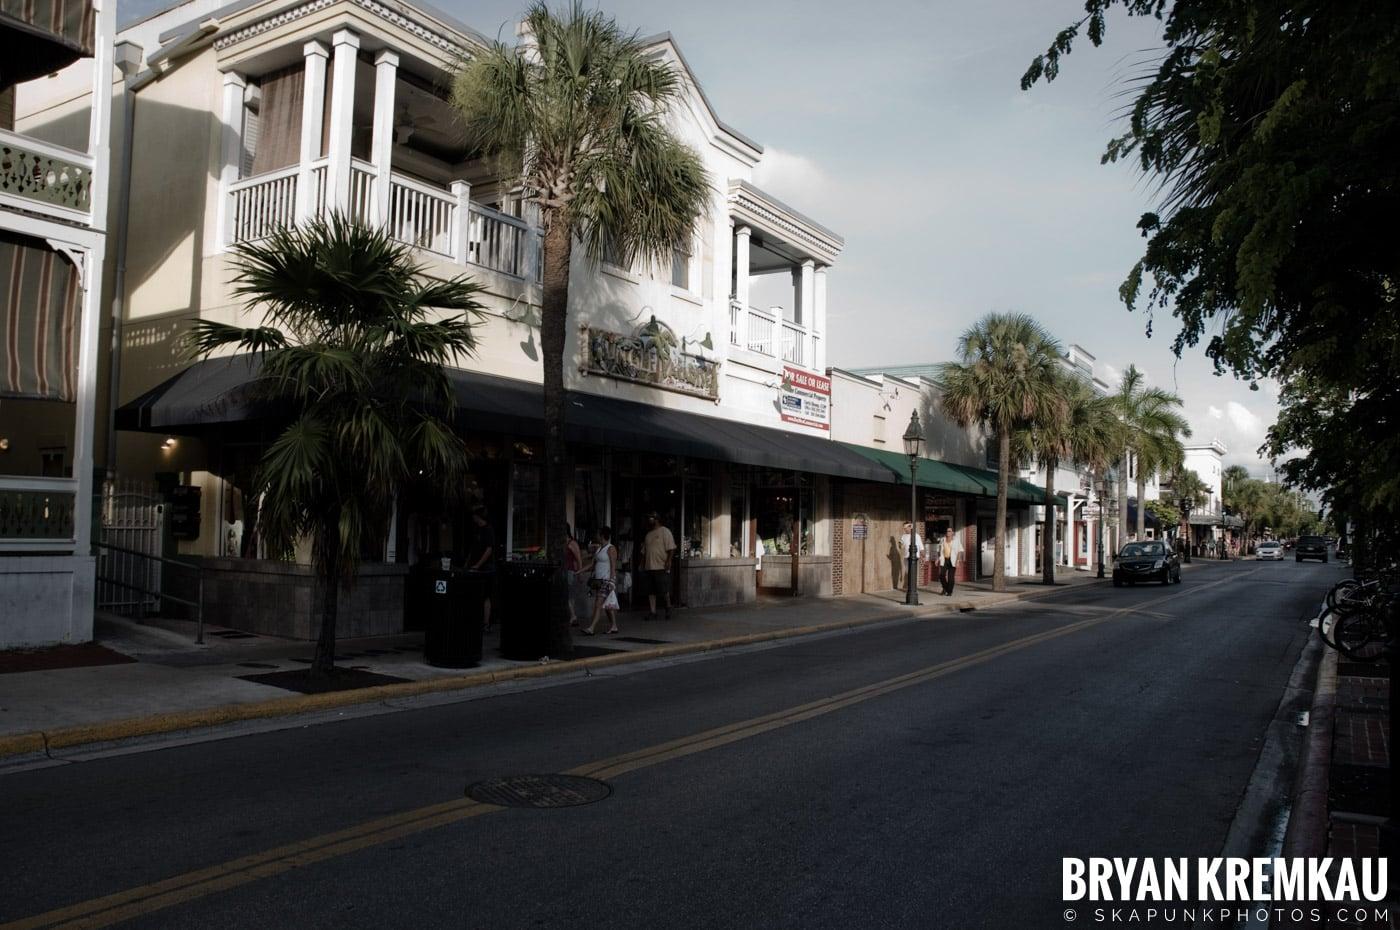 Florida Keys Vacation - 7.09.10 - 7.15.10 (42)